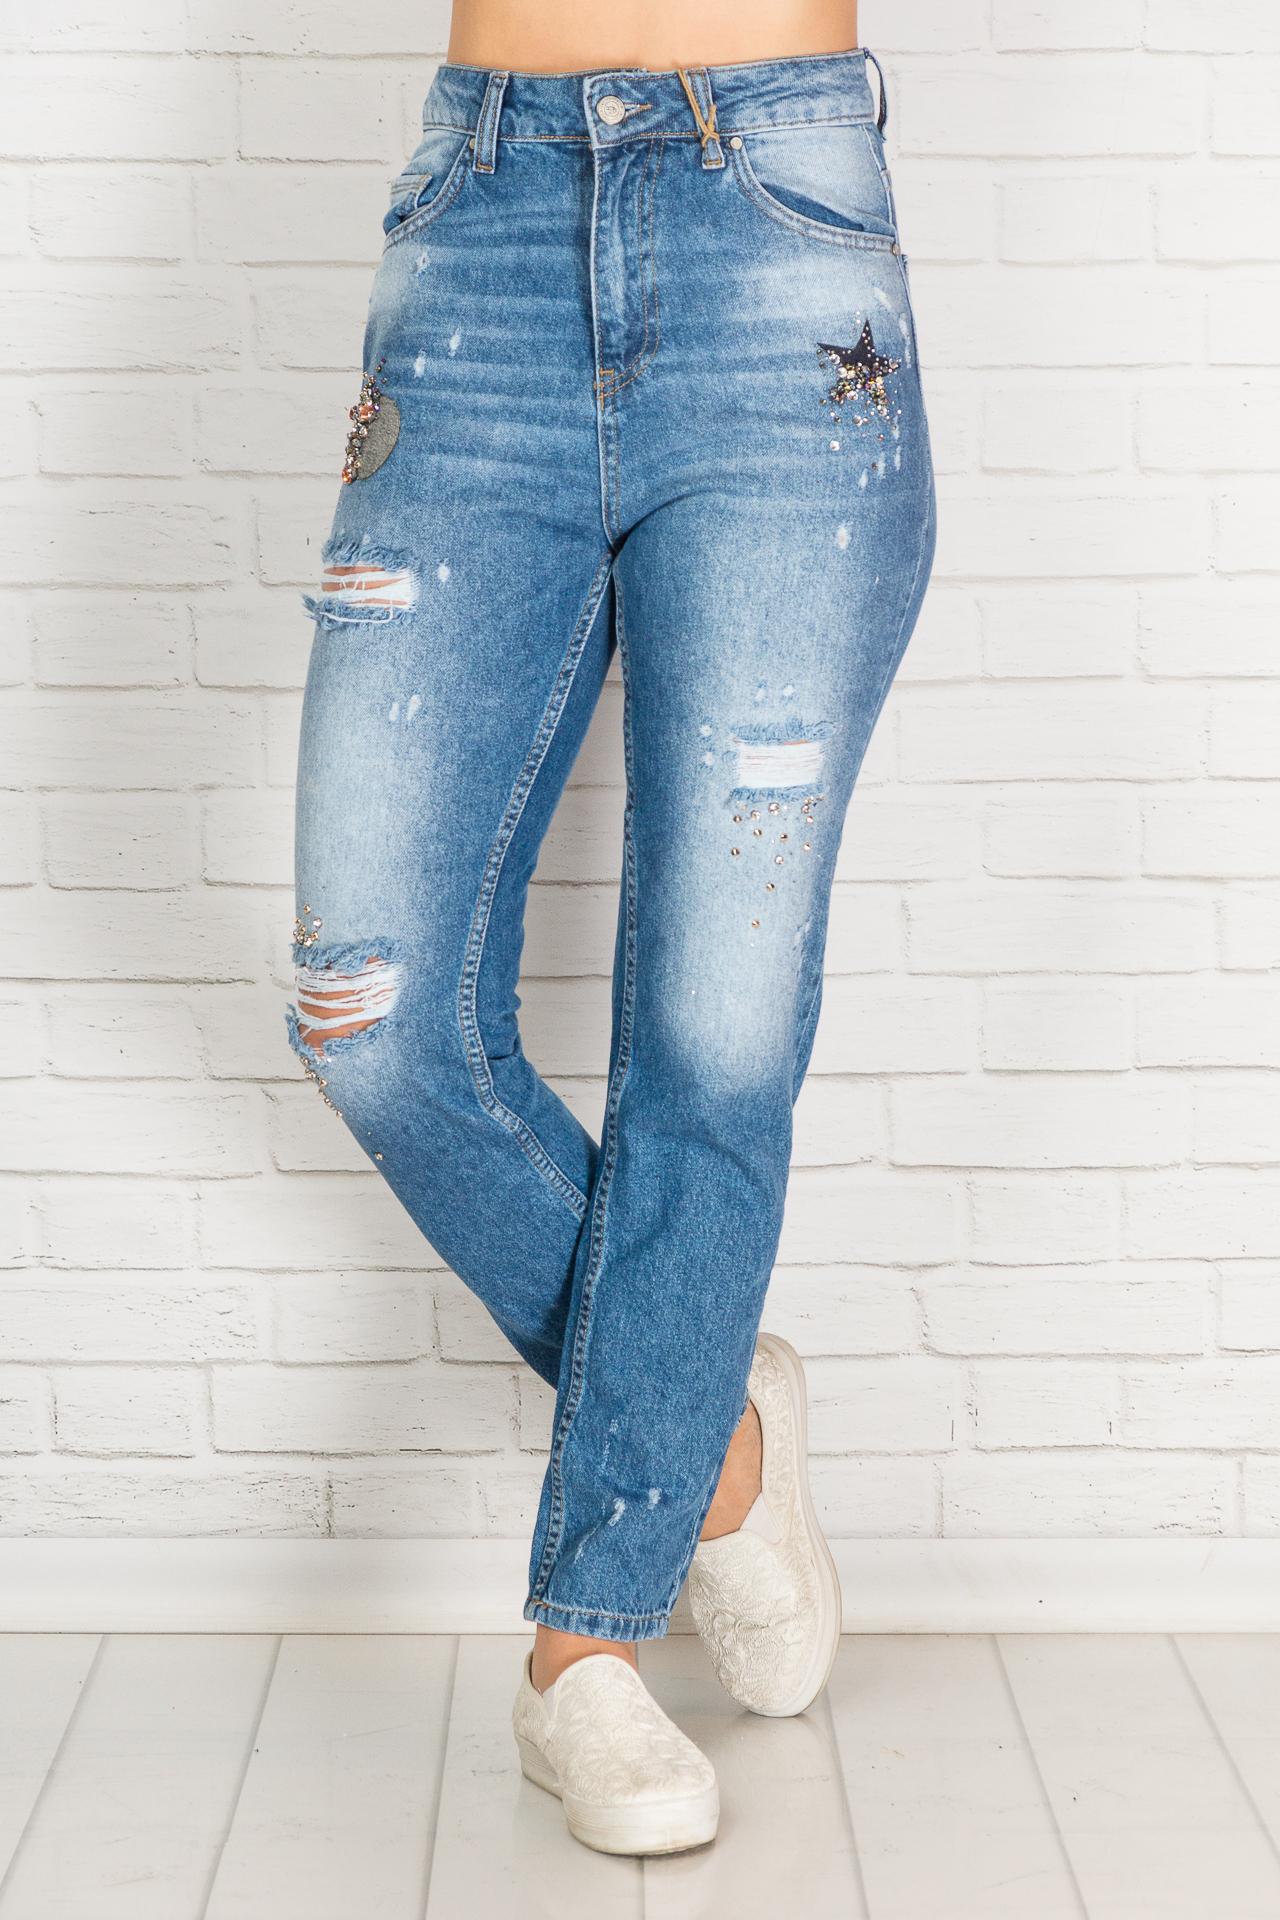 6dc86346a86 Купить джинсы River Star 3008 оптом за 1 450 руб. - FreeJeans